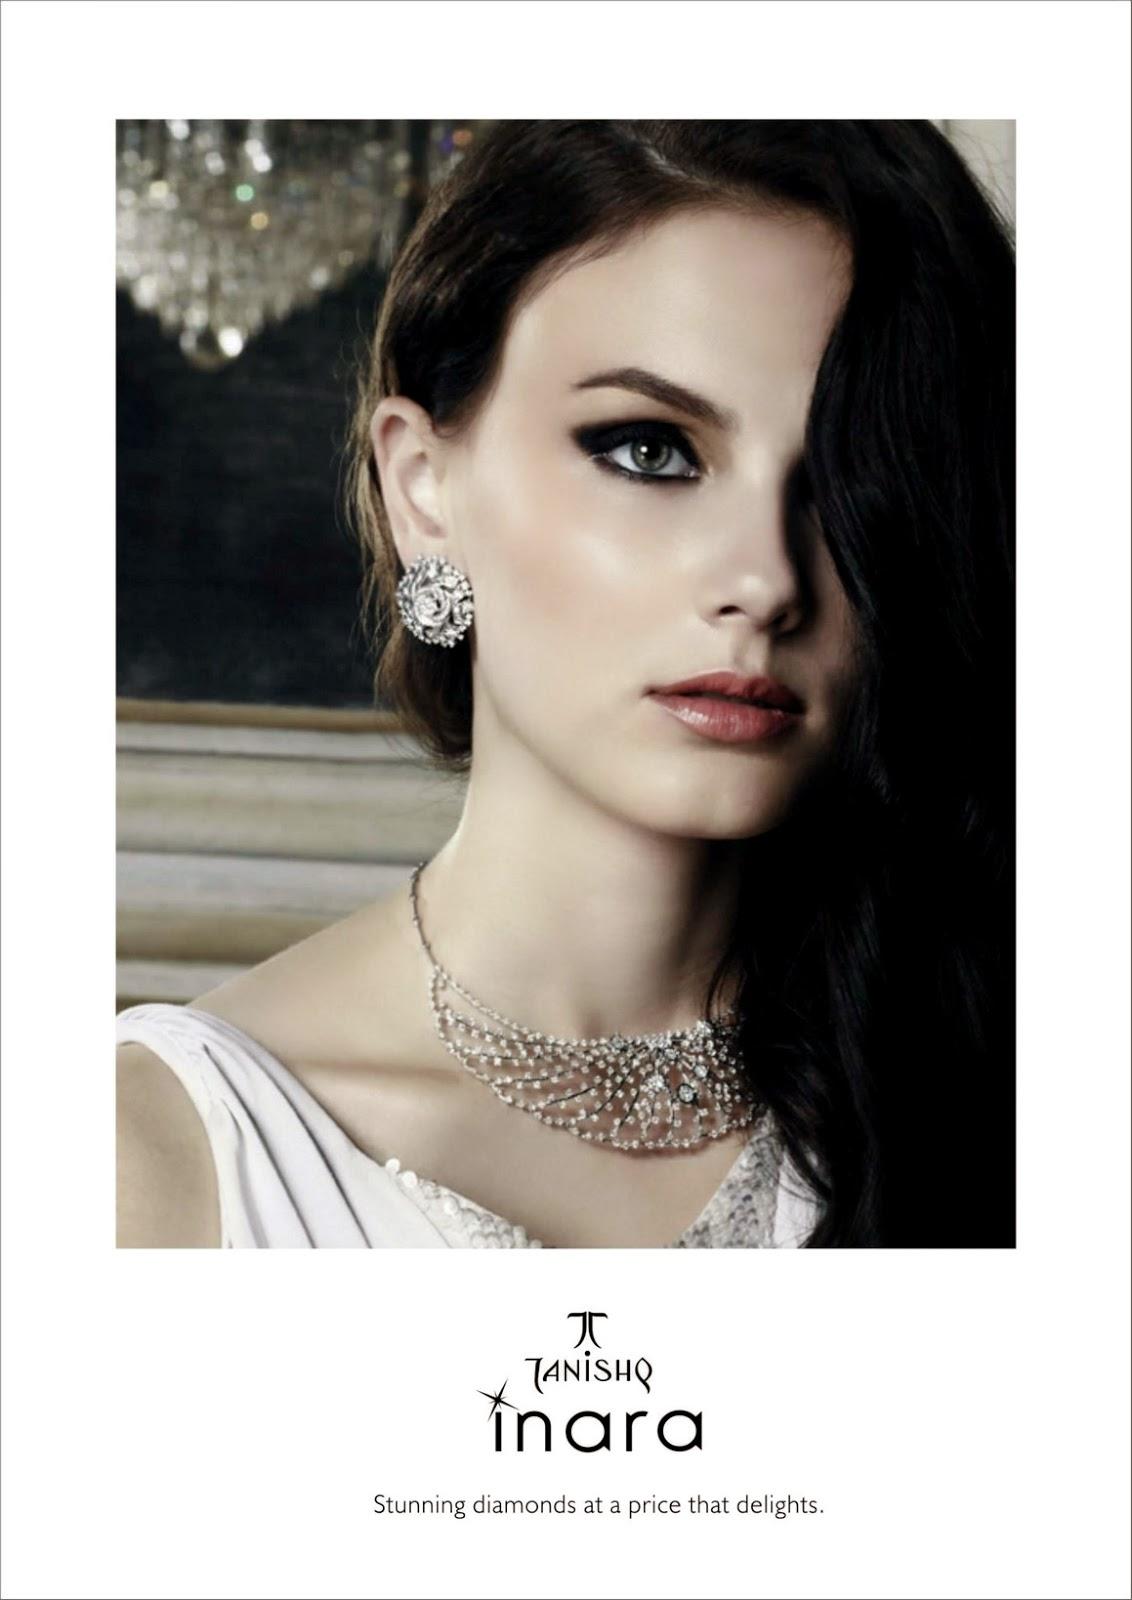 INARA-Glam Diamonds Jewellery For The Diva